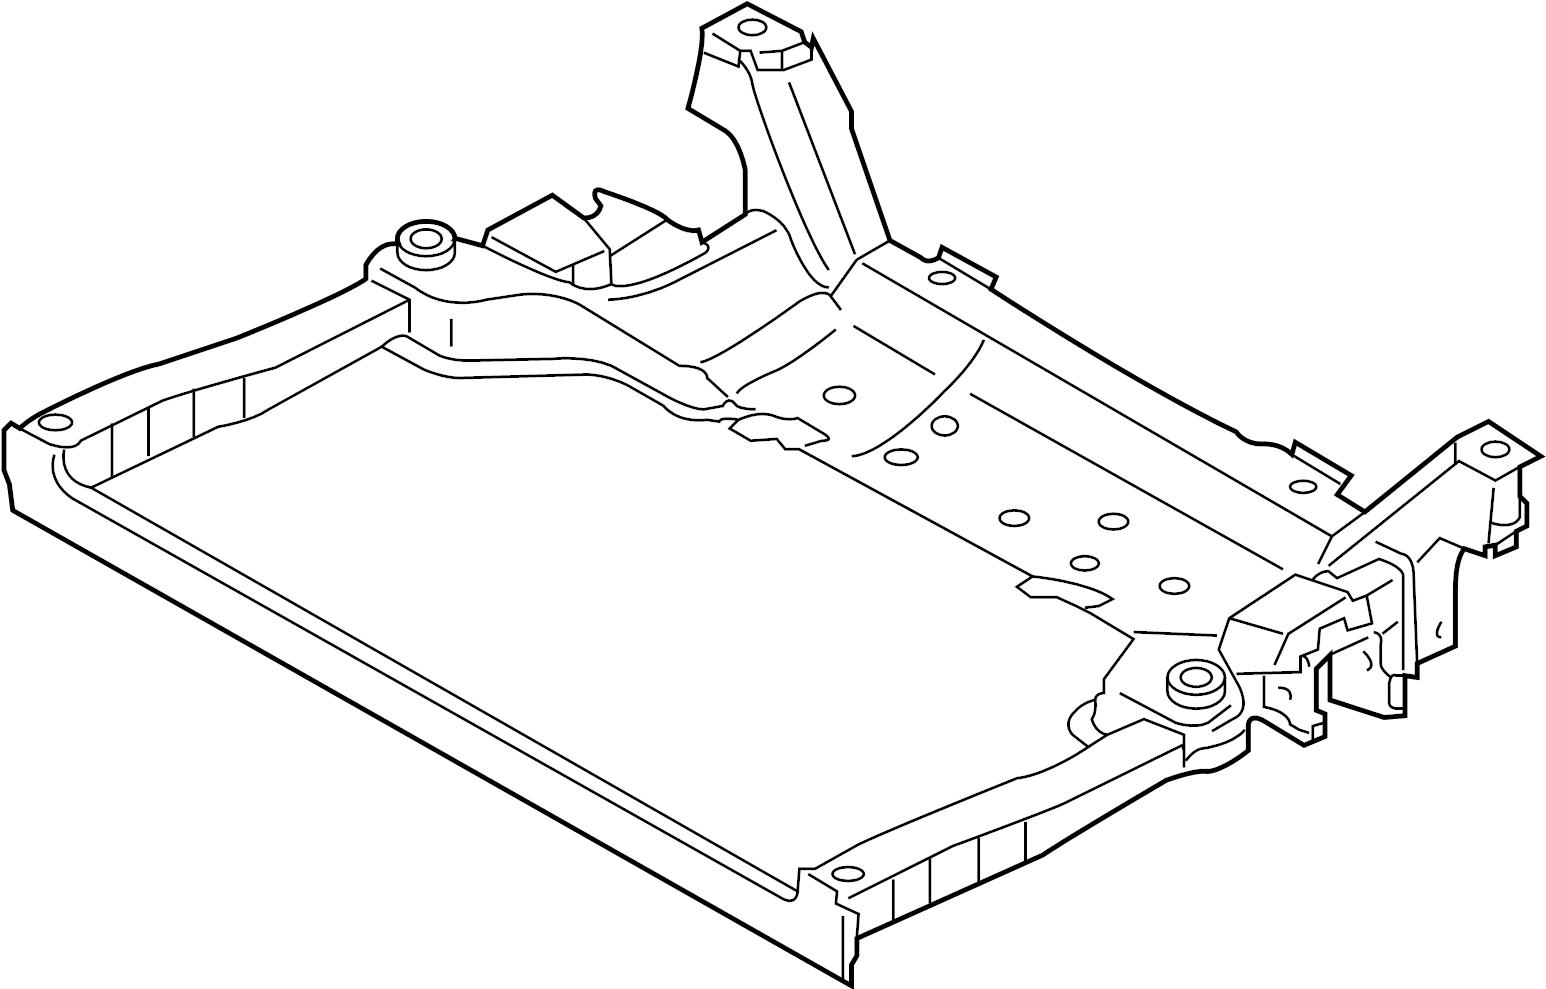 Infiniti M37 Engine Cradle Front Member Absorber